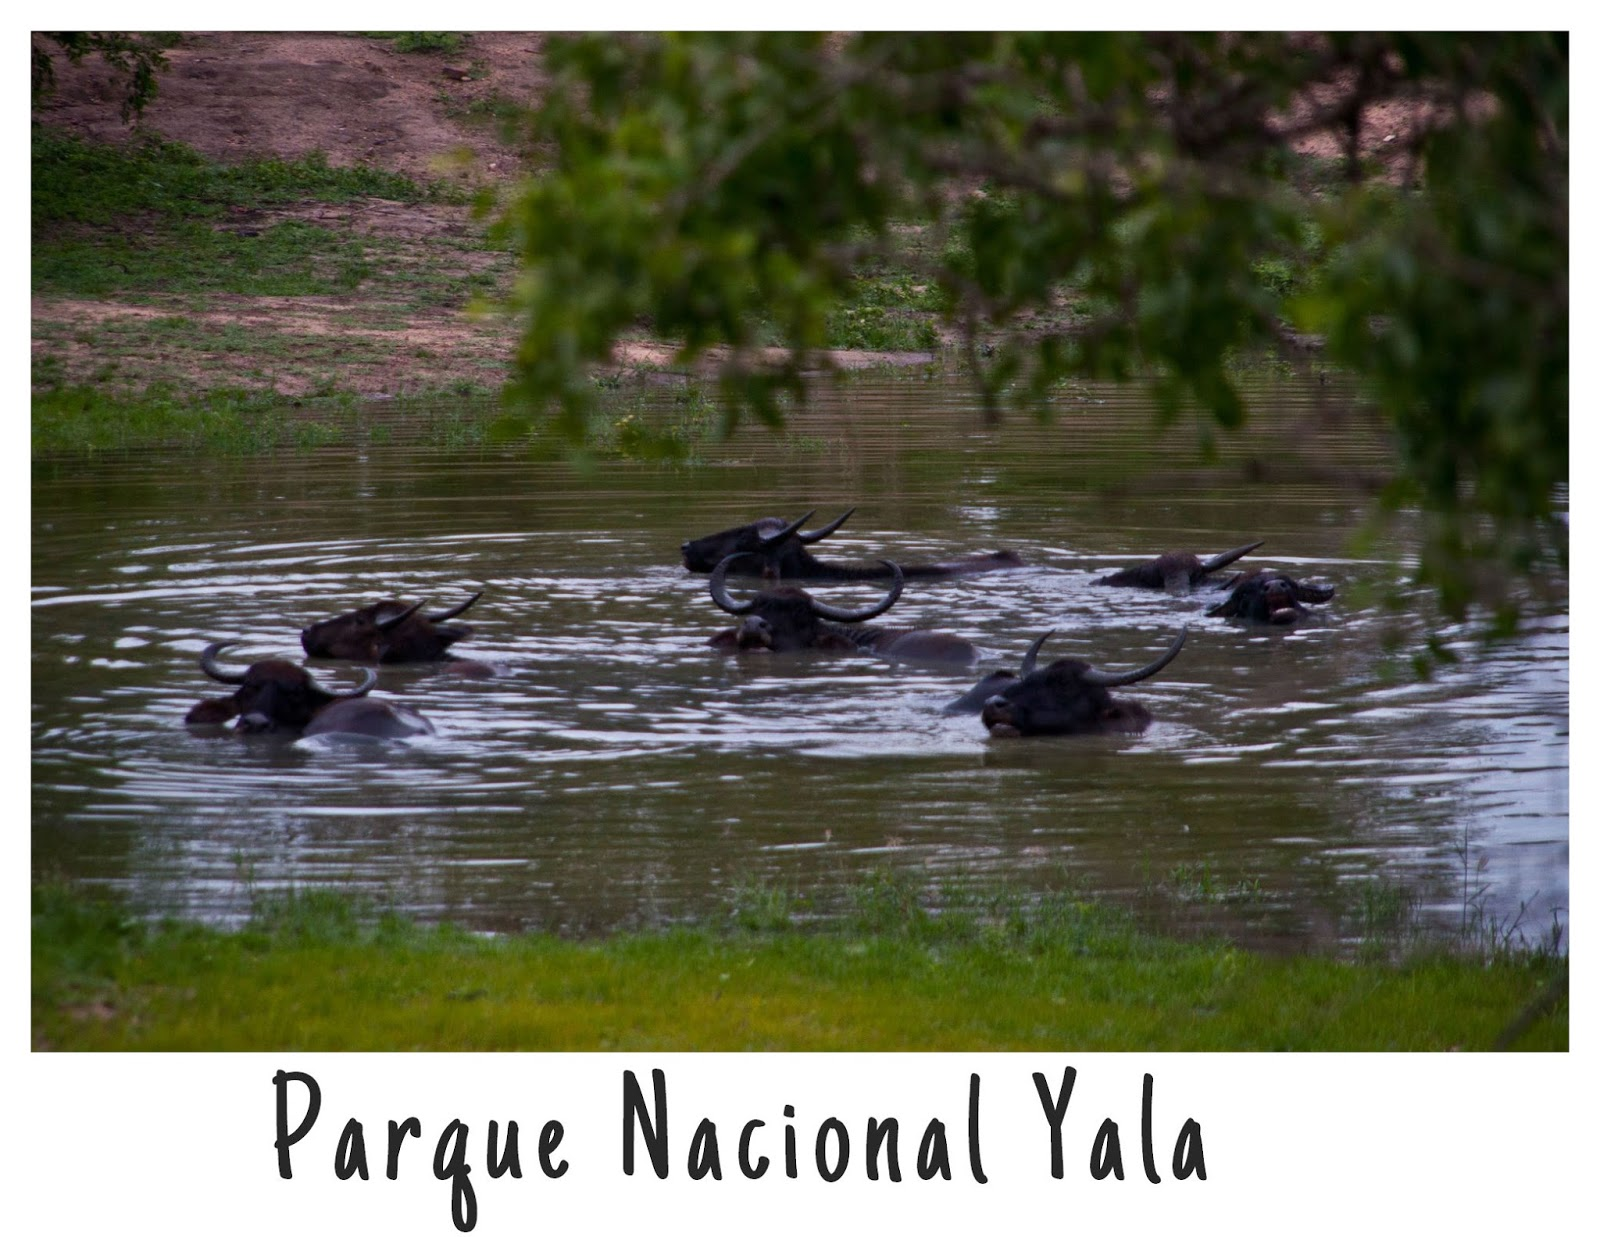 http://www.depatitasenelmundo.es/2015/01/yala-un-safari-para-principiantes.html